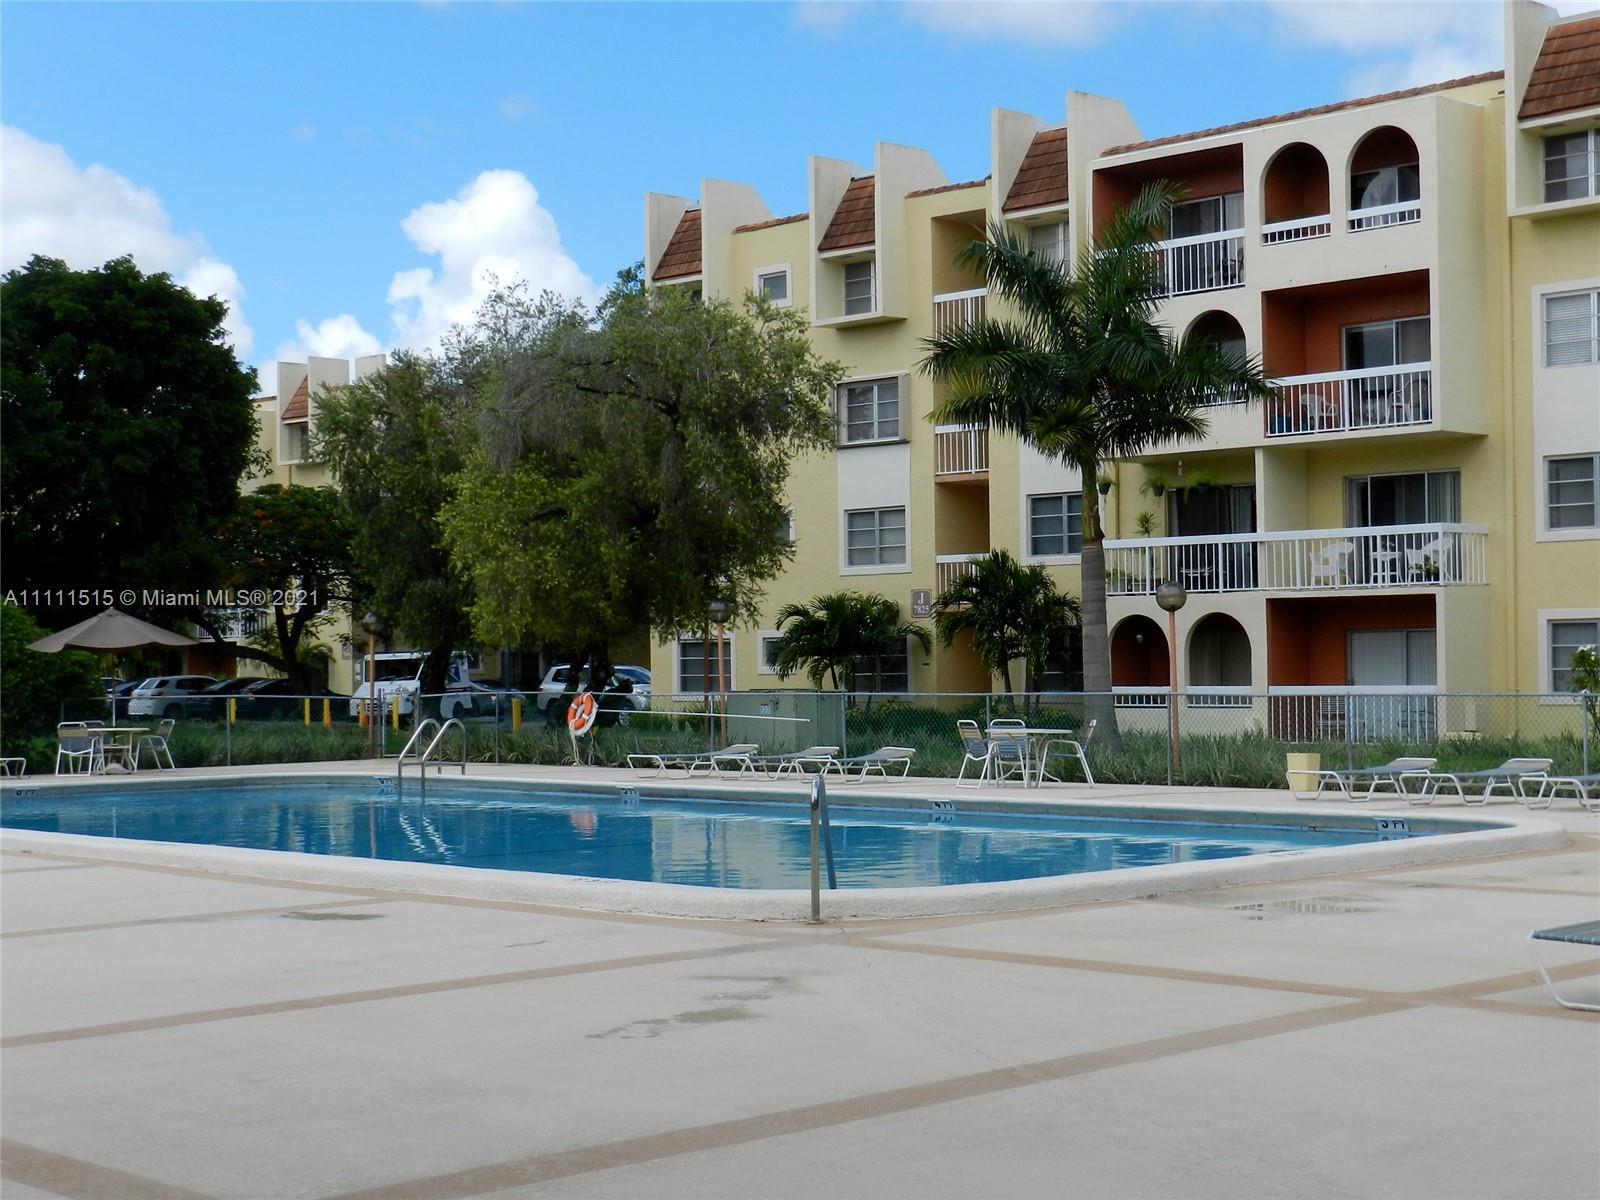 7701 Camino Real Unit 418, Miami, Florida 33143